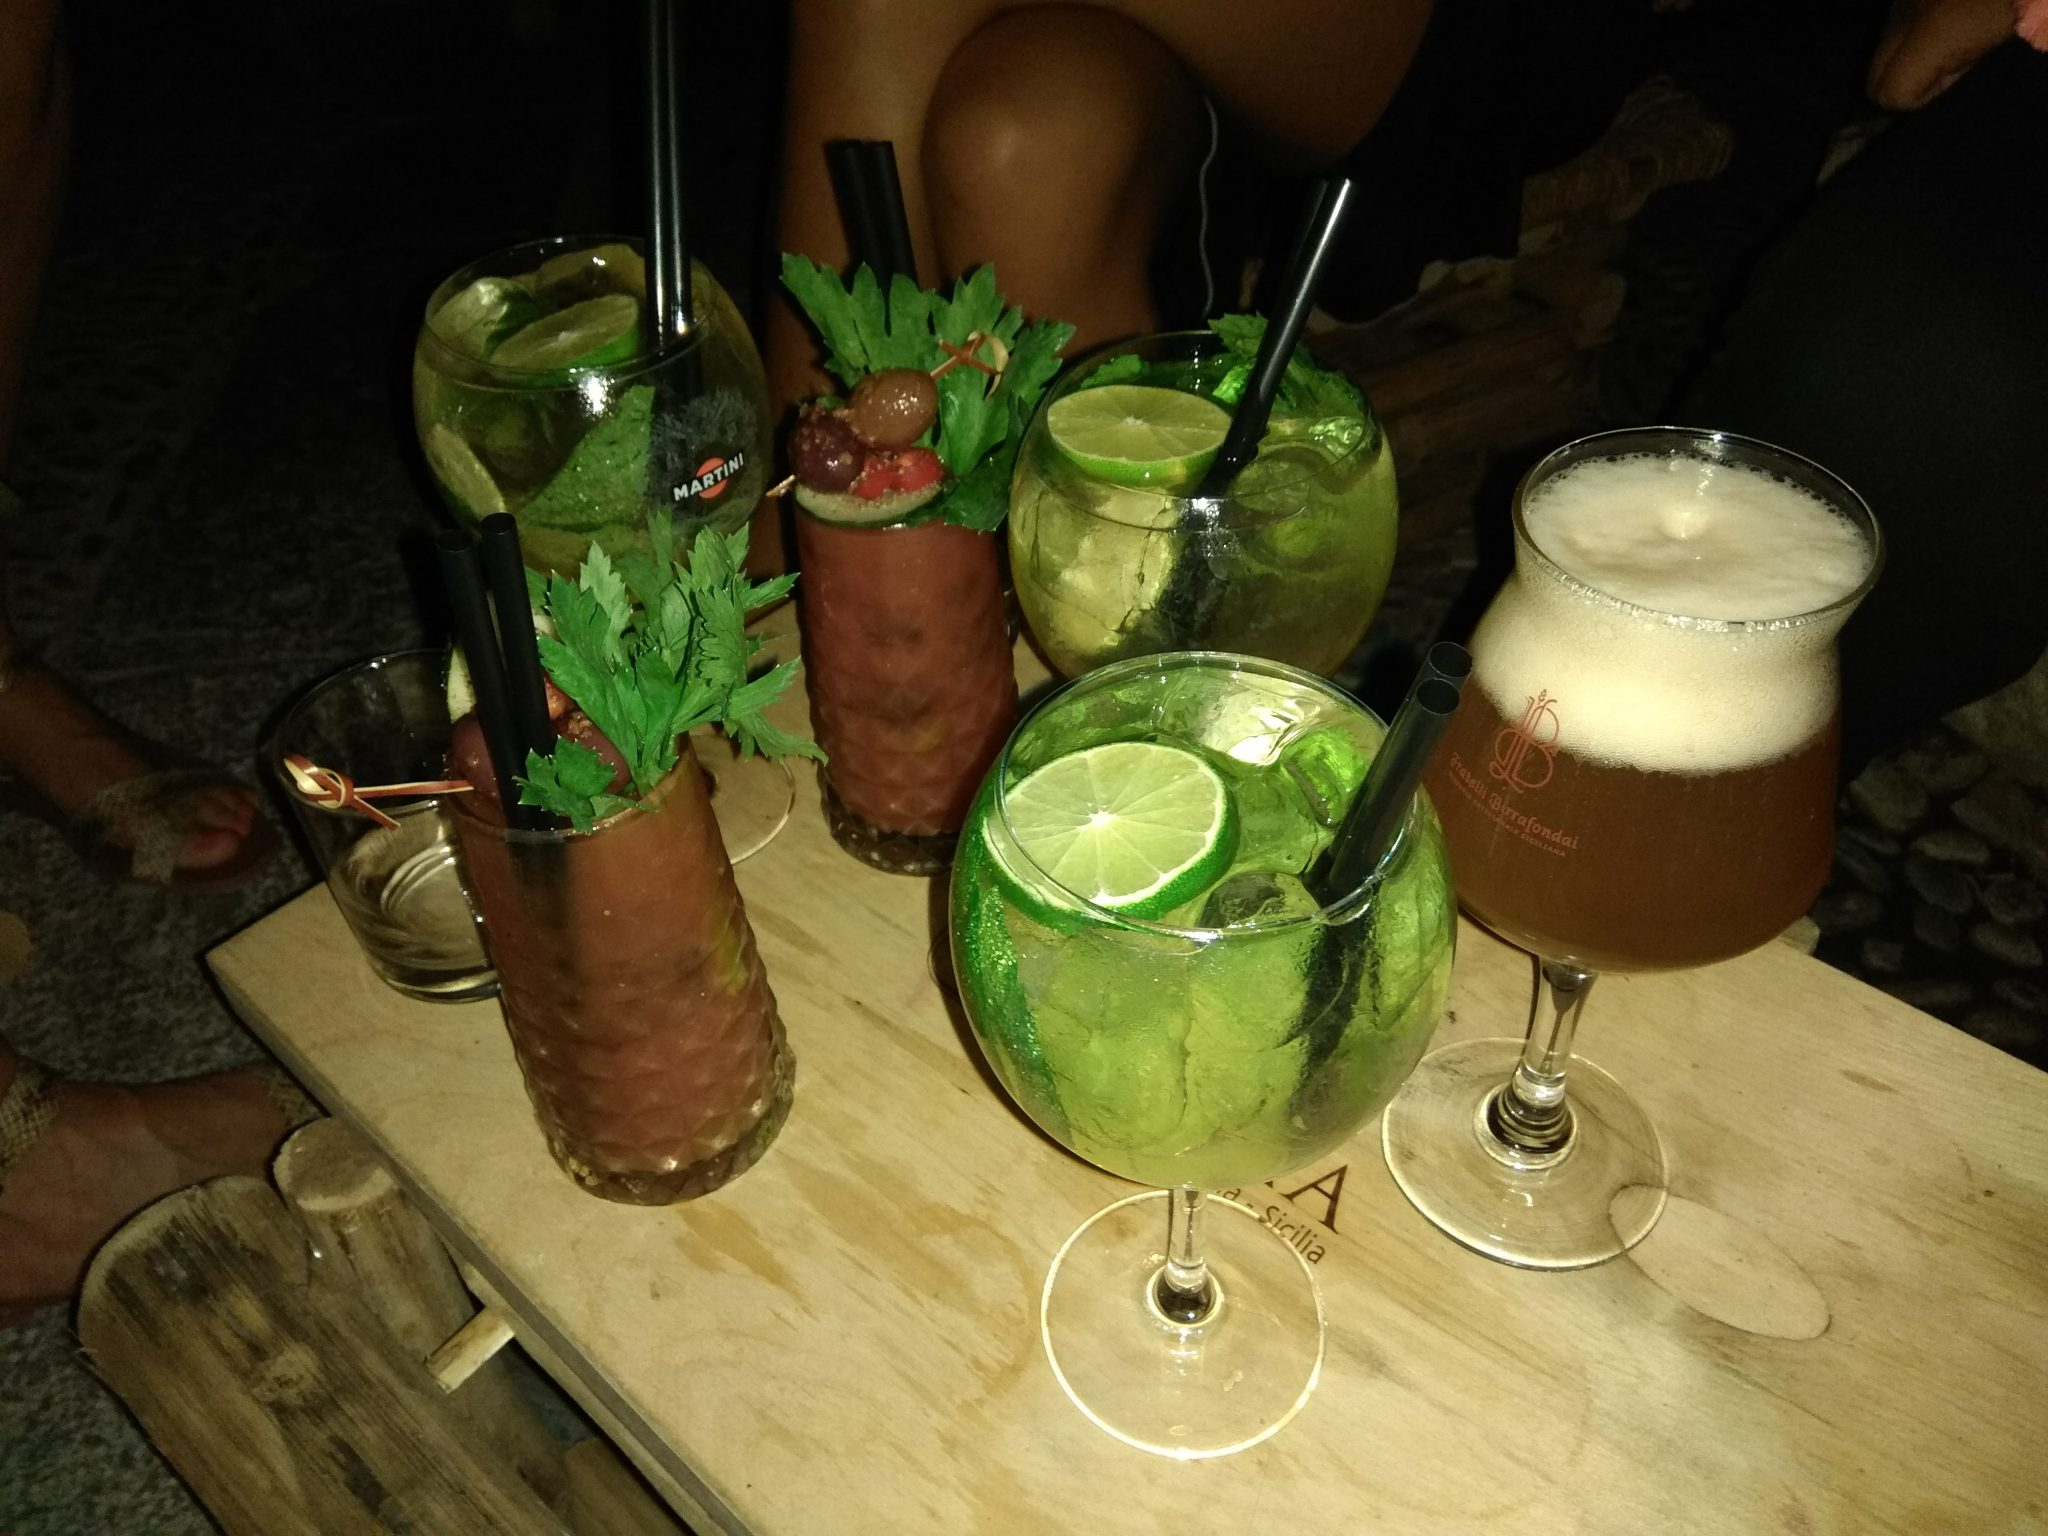 Img post Cócteles. Comer en Taormina - Pasaporte y Millas